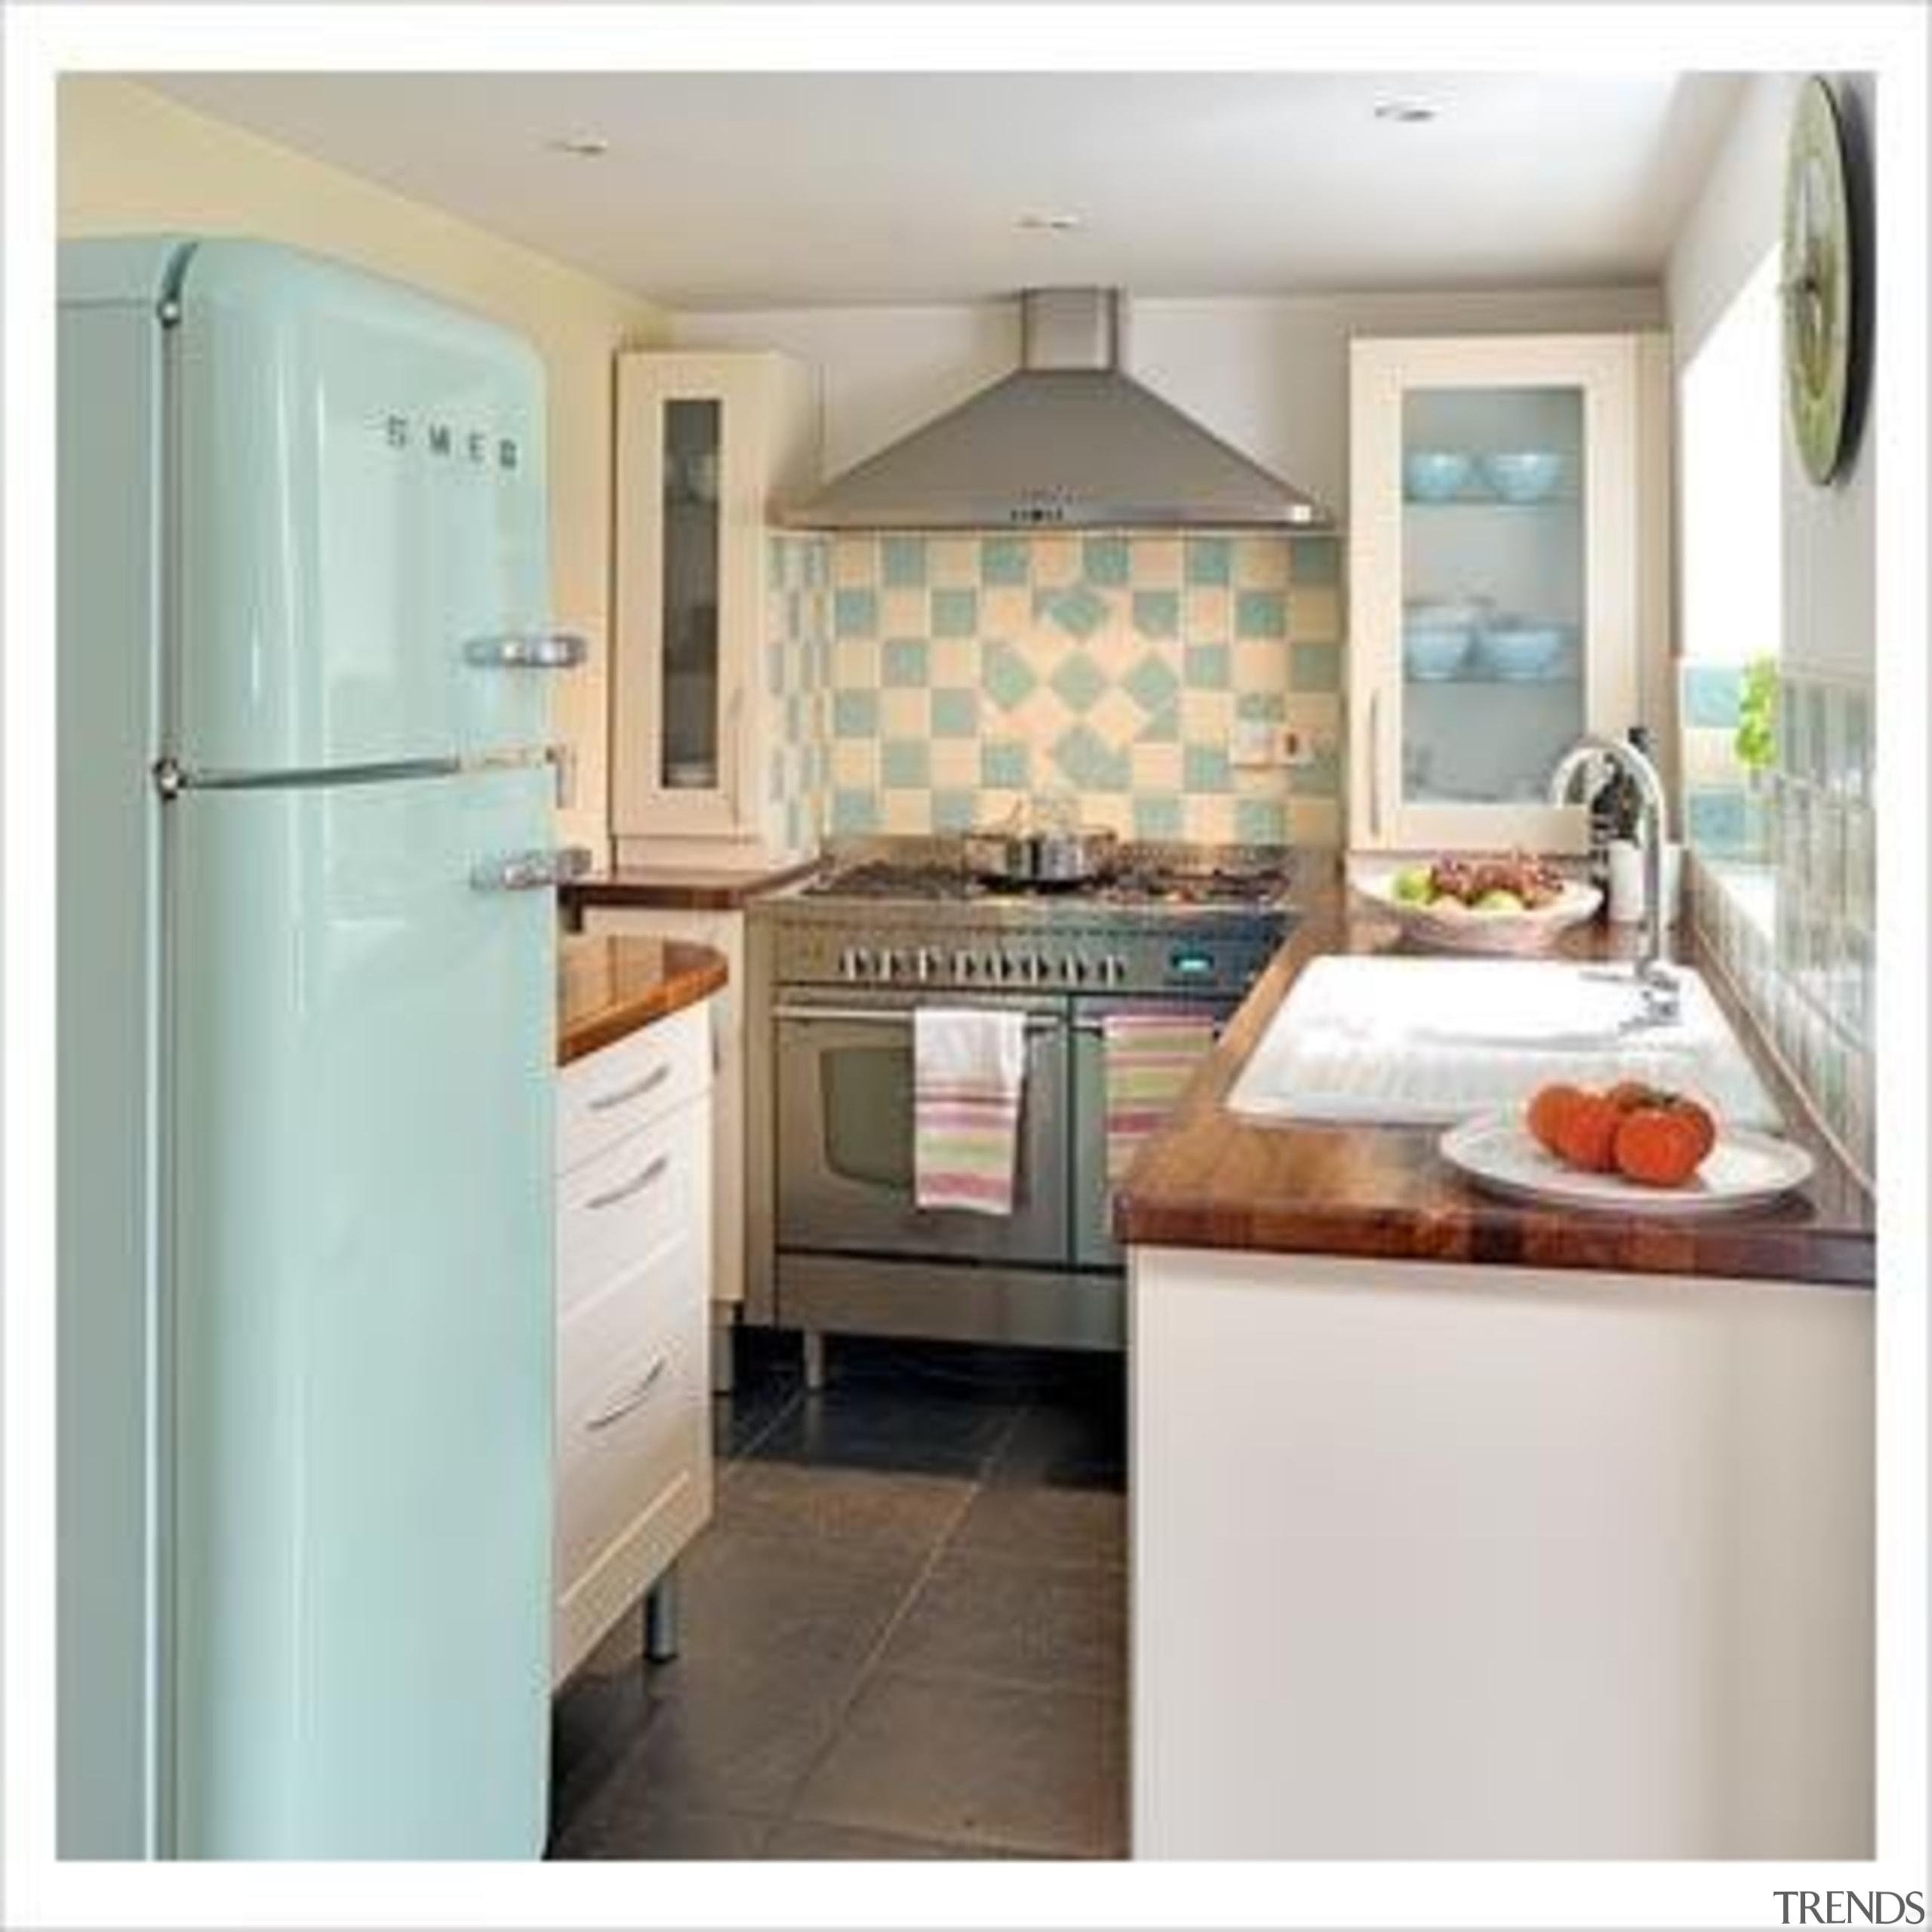 Smeg Kitchen Appliances Gallery 4 Trends